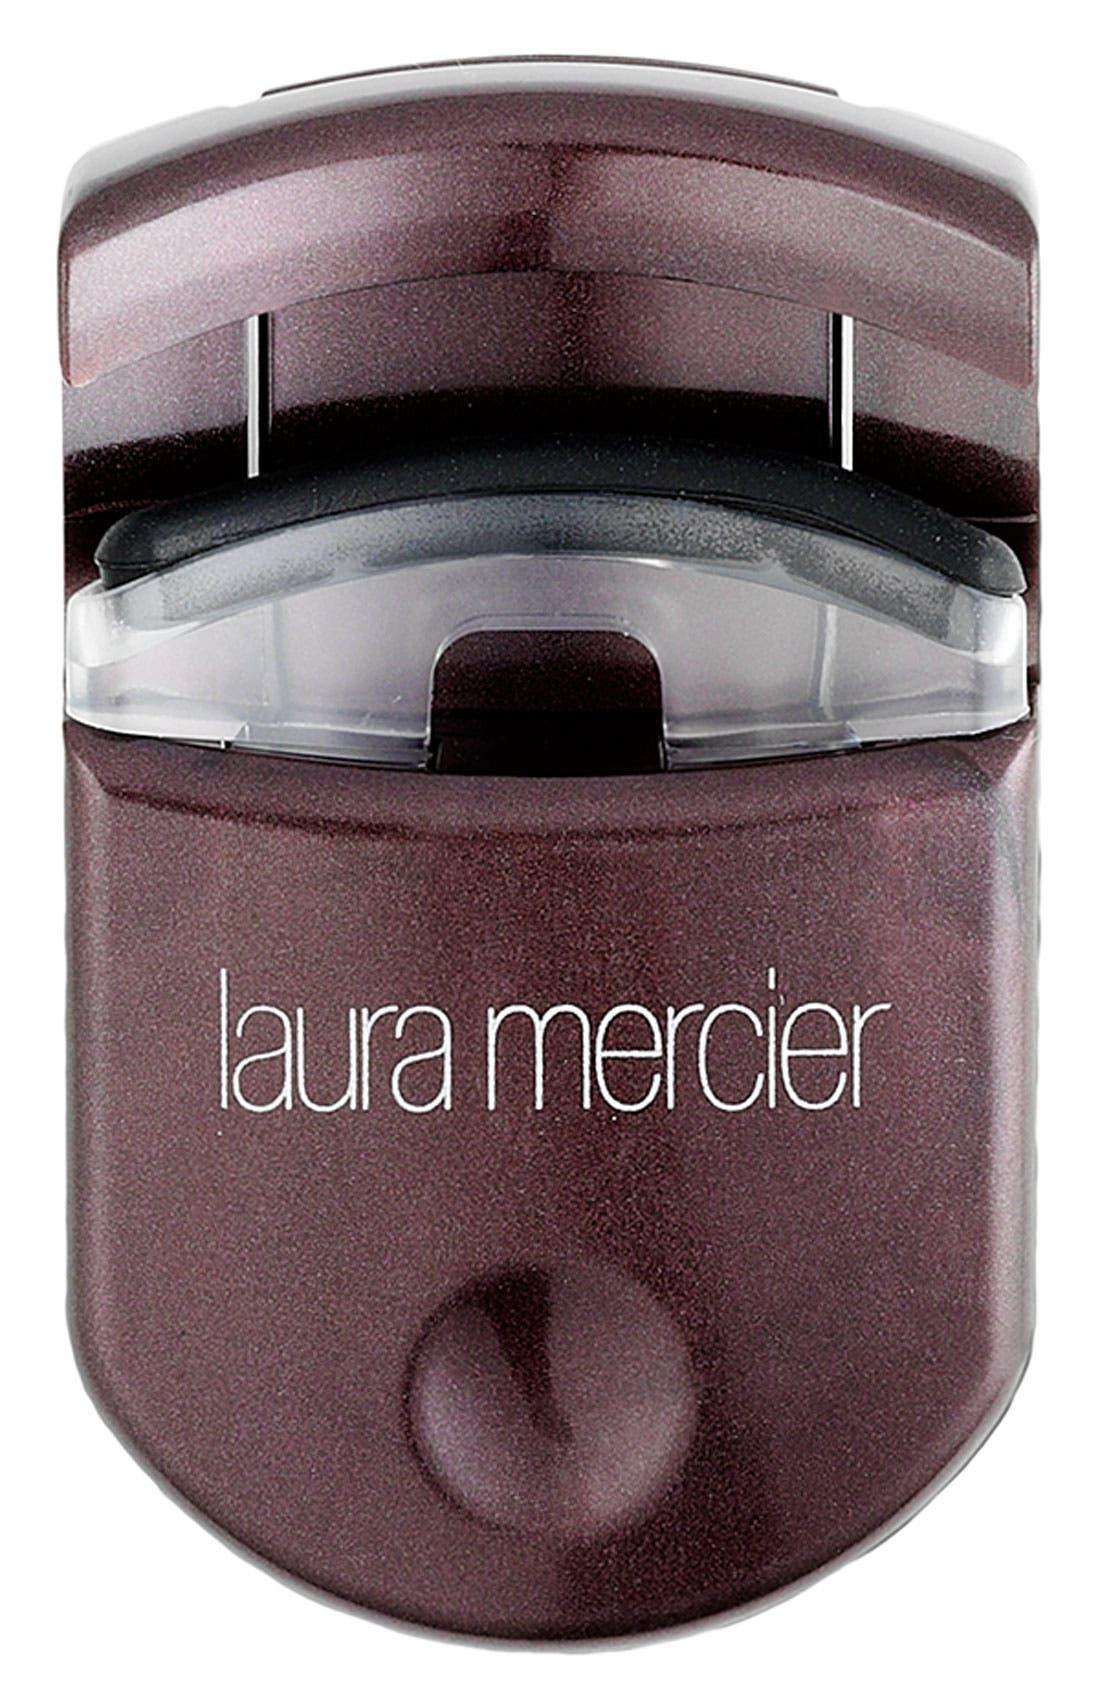 LAURA MERCIER, Eyelash Curler, Main thumbnail 1, color, NO COLOR